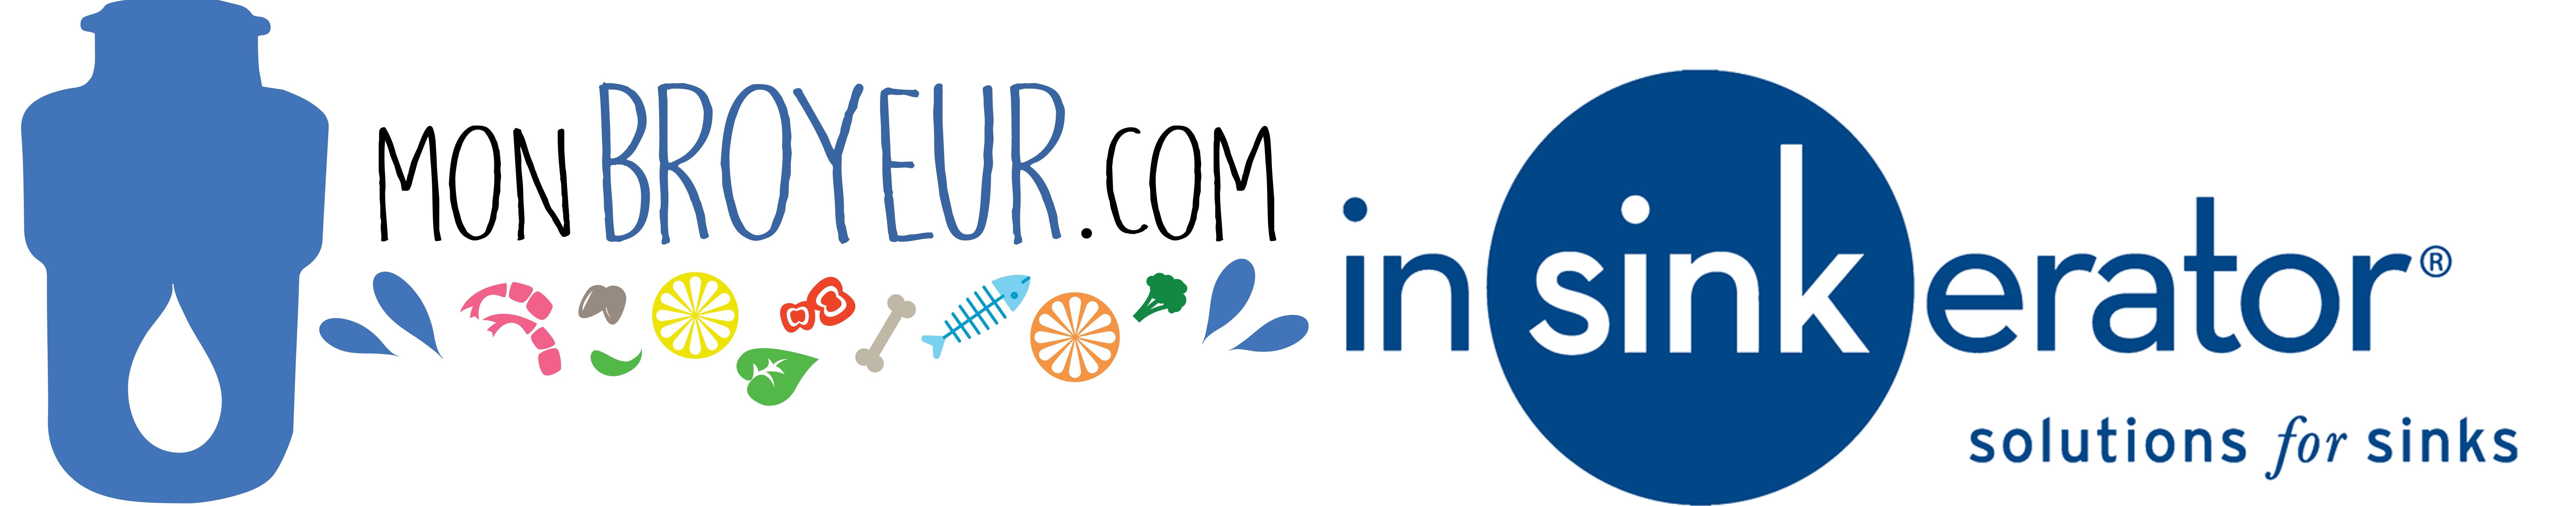 MonBroyeur.com by ITD | InSinkErator